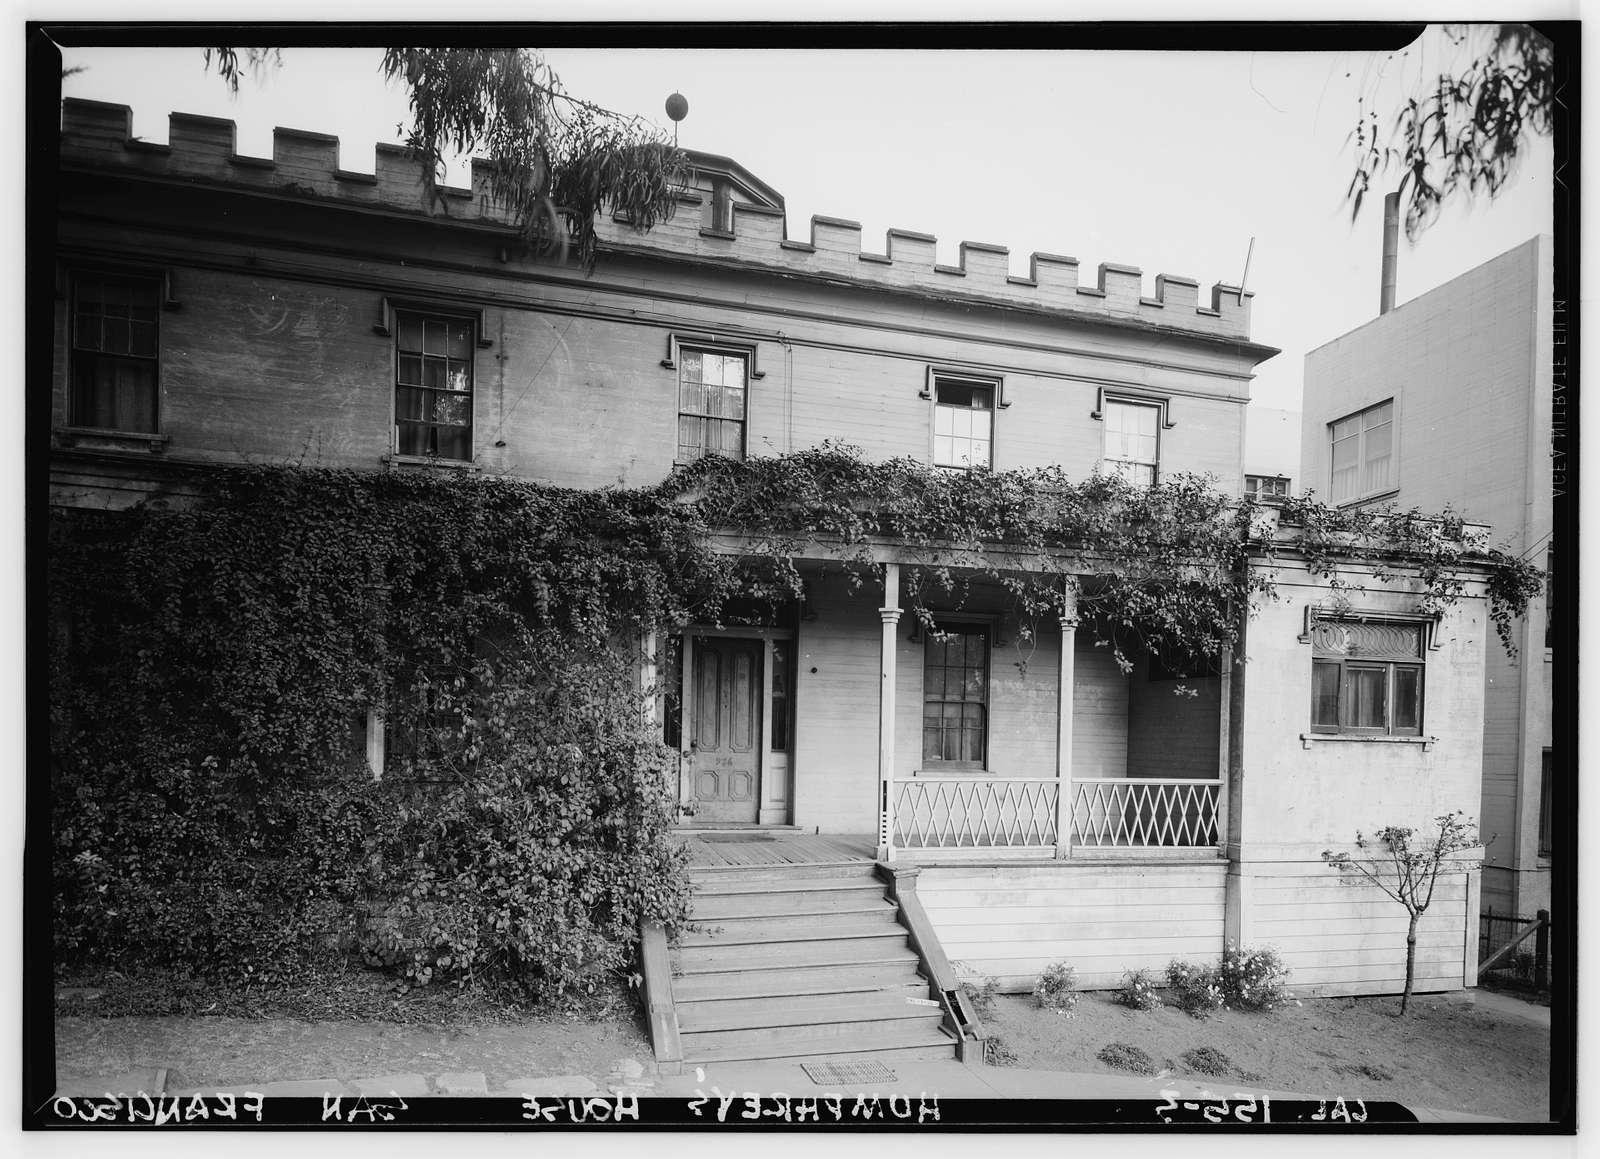 Humphrey House, 986 Chestnut Street, San Francisco, San Francisco County, CA